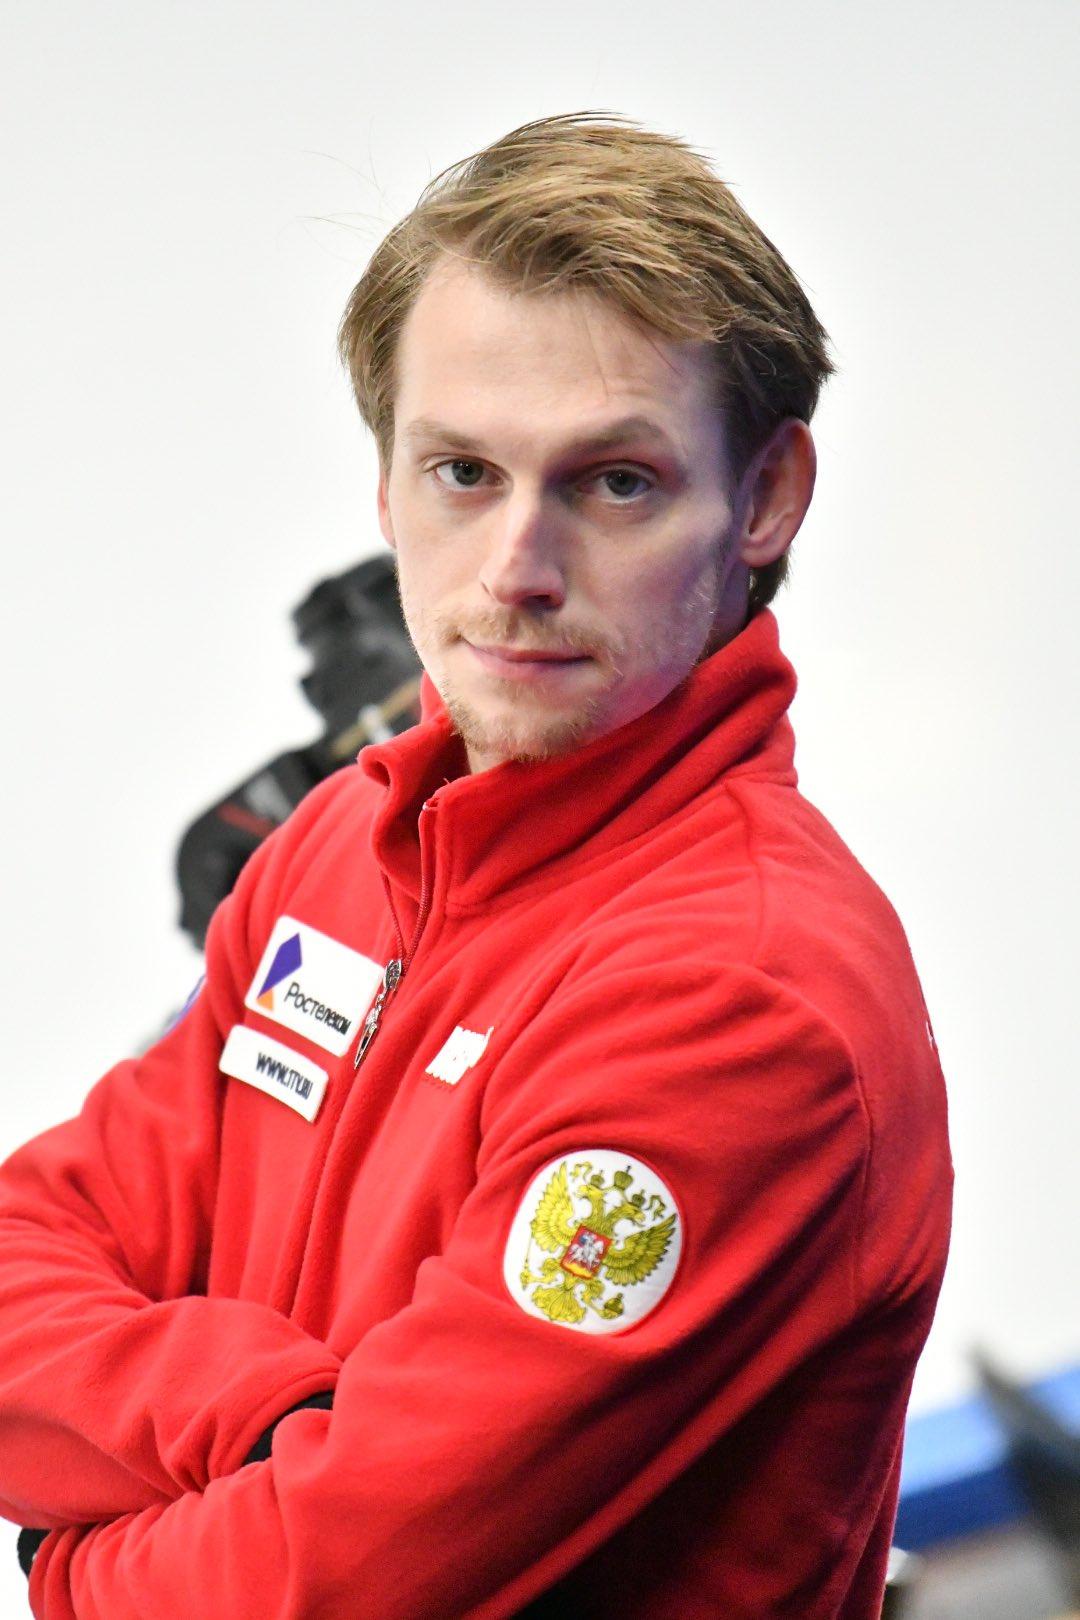 Challenger (6) - Finlandia Trophy. Oct 11 - 13, 2019. Espoo /FIN      - Страница 10 EGpcXERWoAAvqNE?format=jpg&name=large